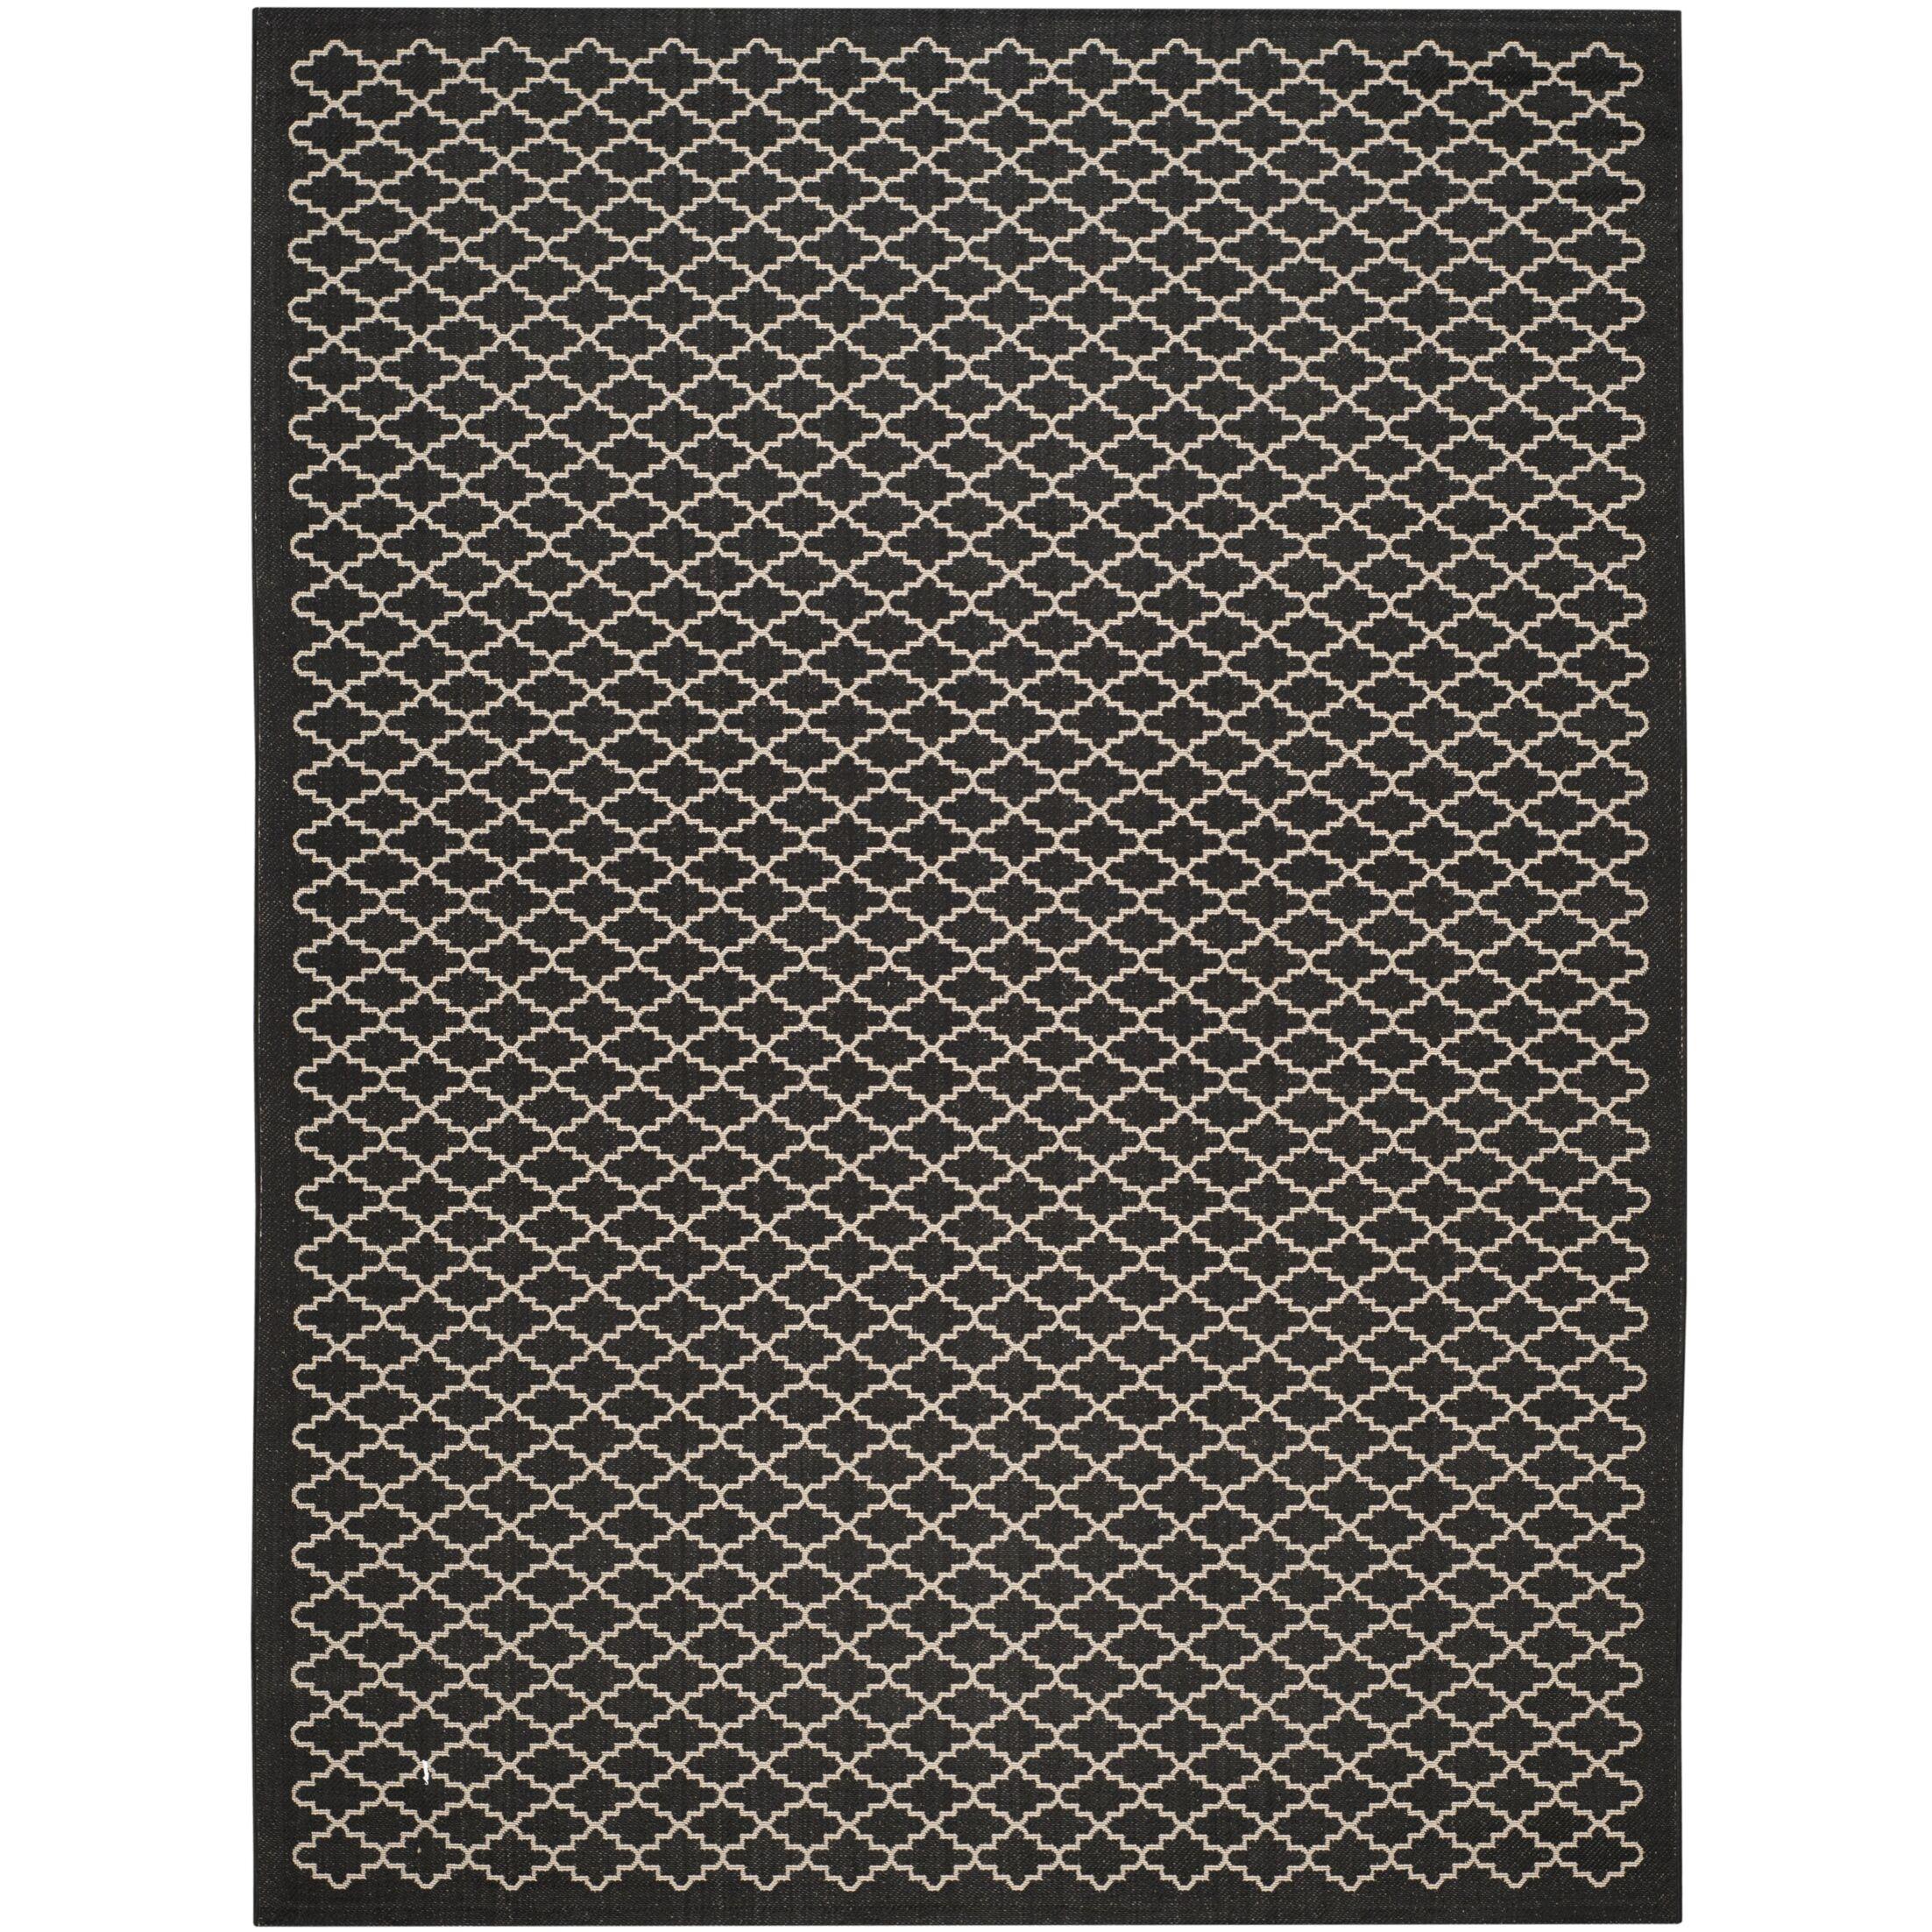 Bexton Black / Beige Outdoor Area Rug Rug Size: Rectangle 9' x 12'6